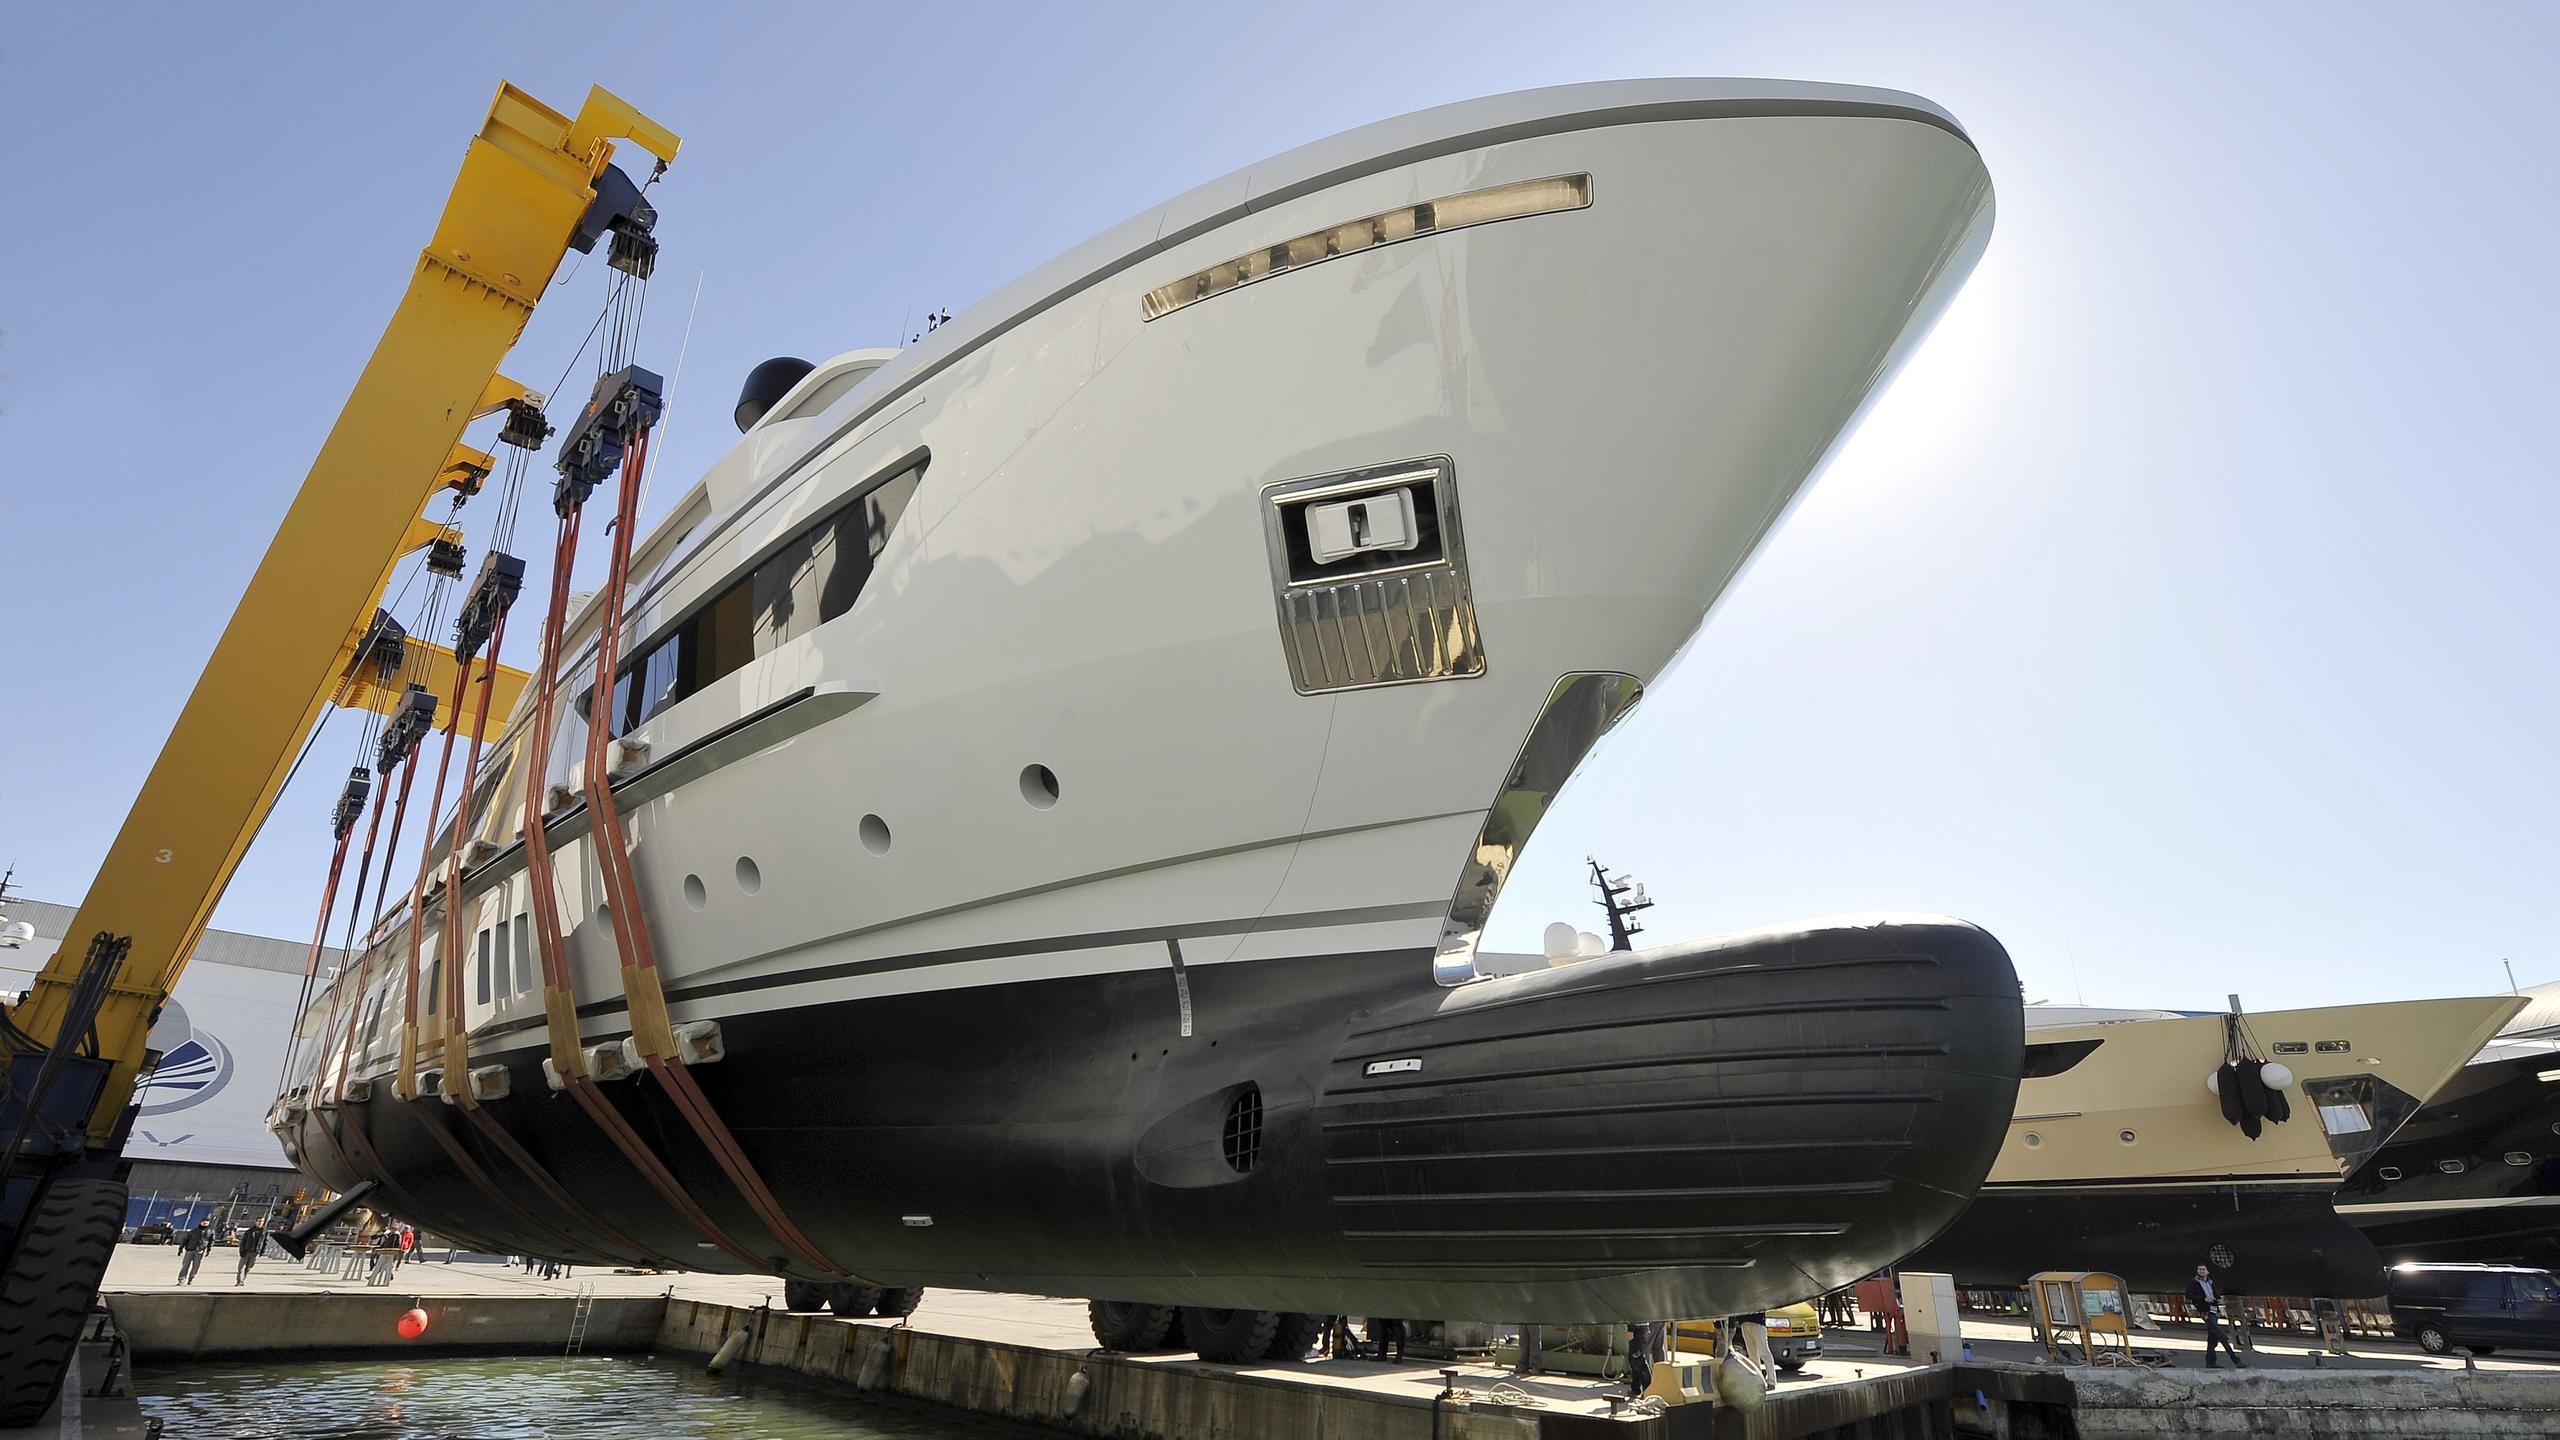 x-motor-yacht-sanlorenzo-460-Exp-2016-42m-yard